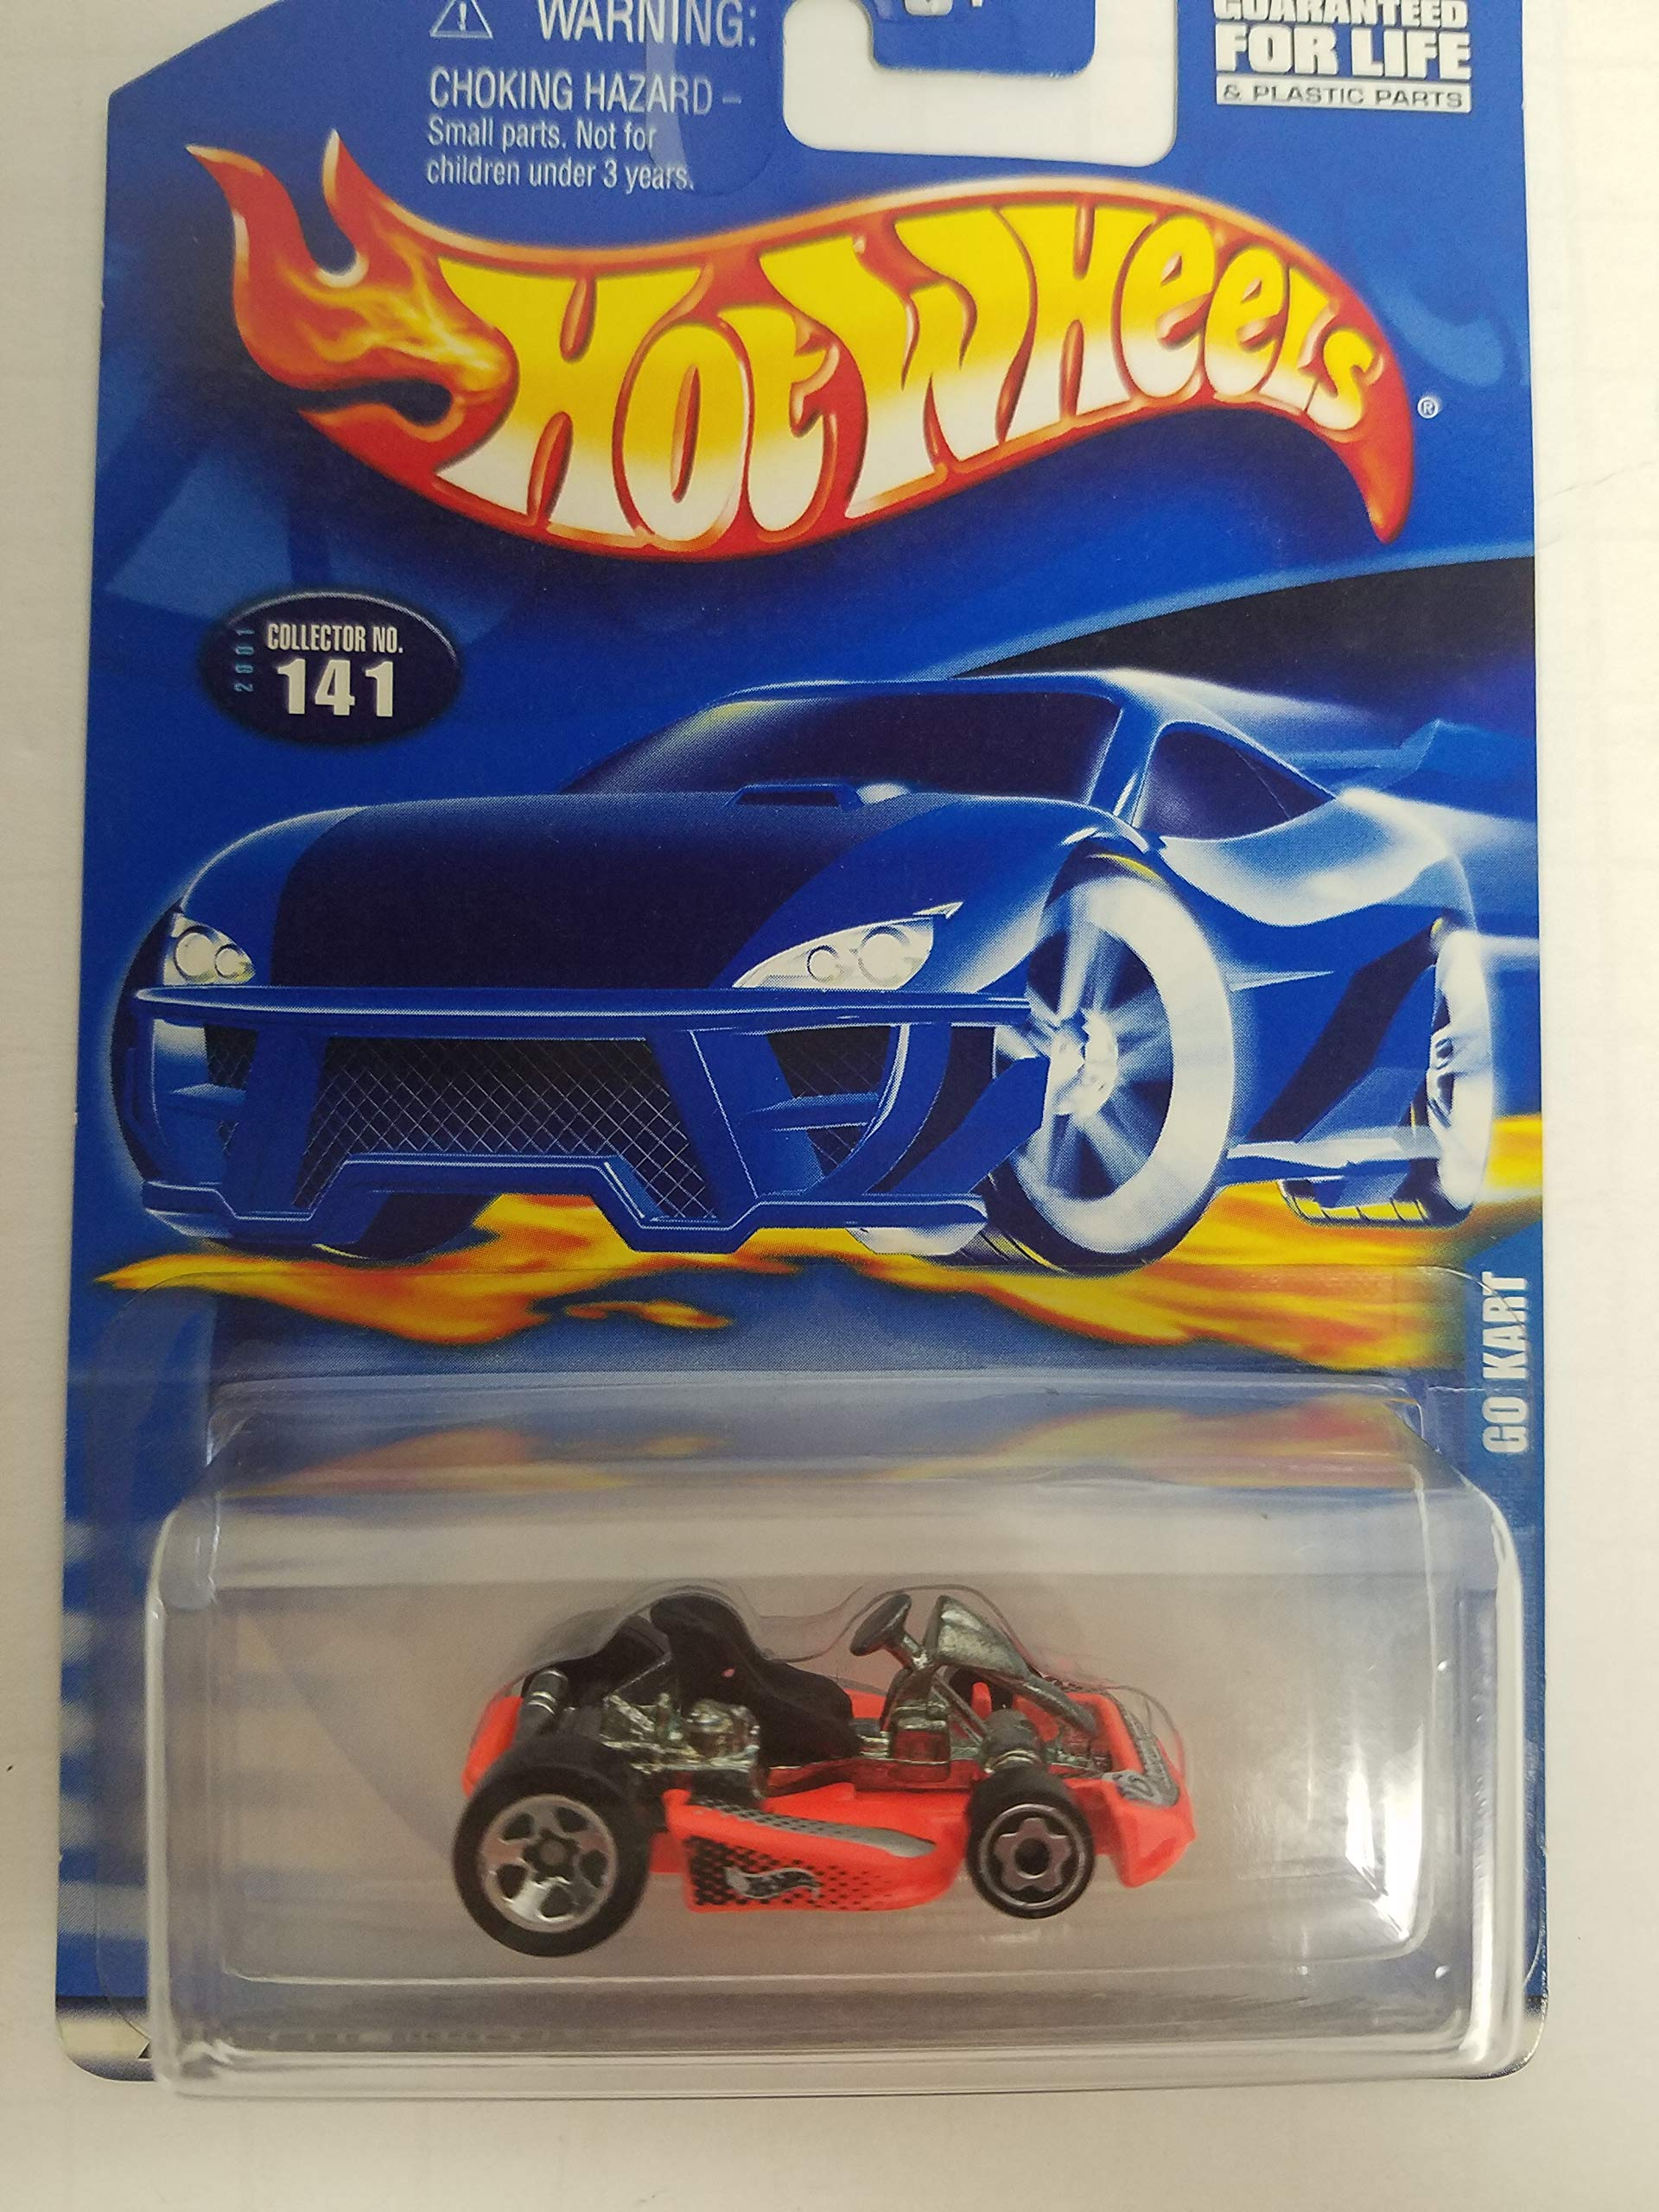 Go Cart Hot Wheels 2001 diecast 1/64 scale car No. 141